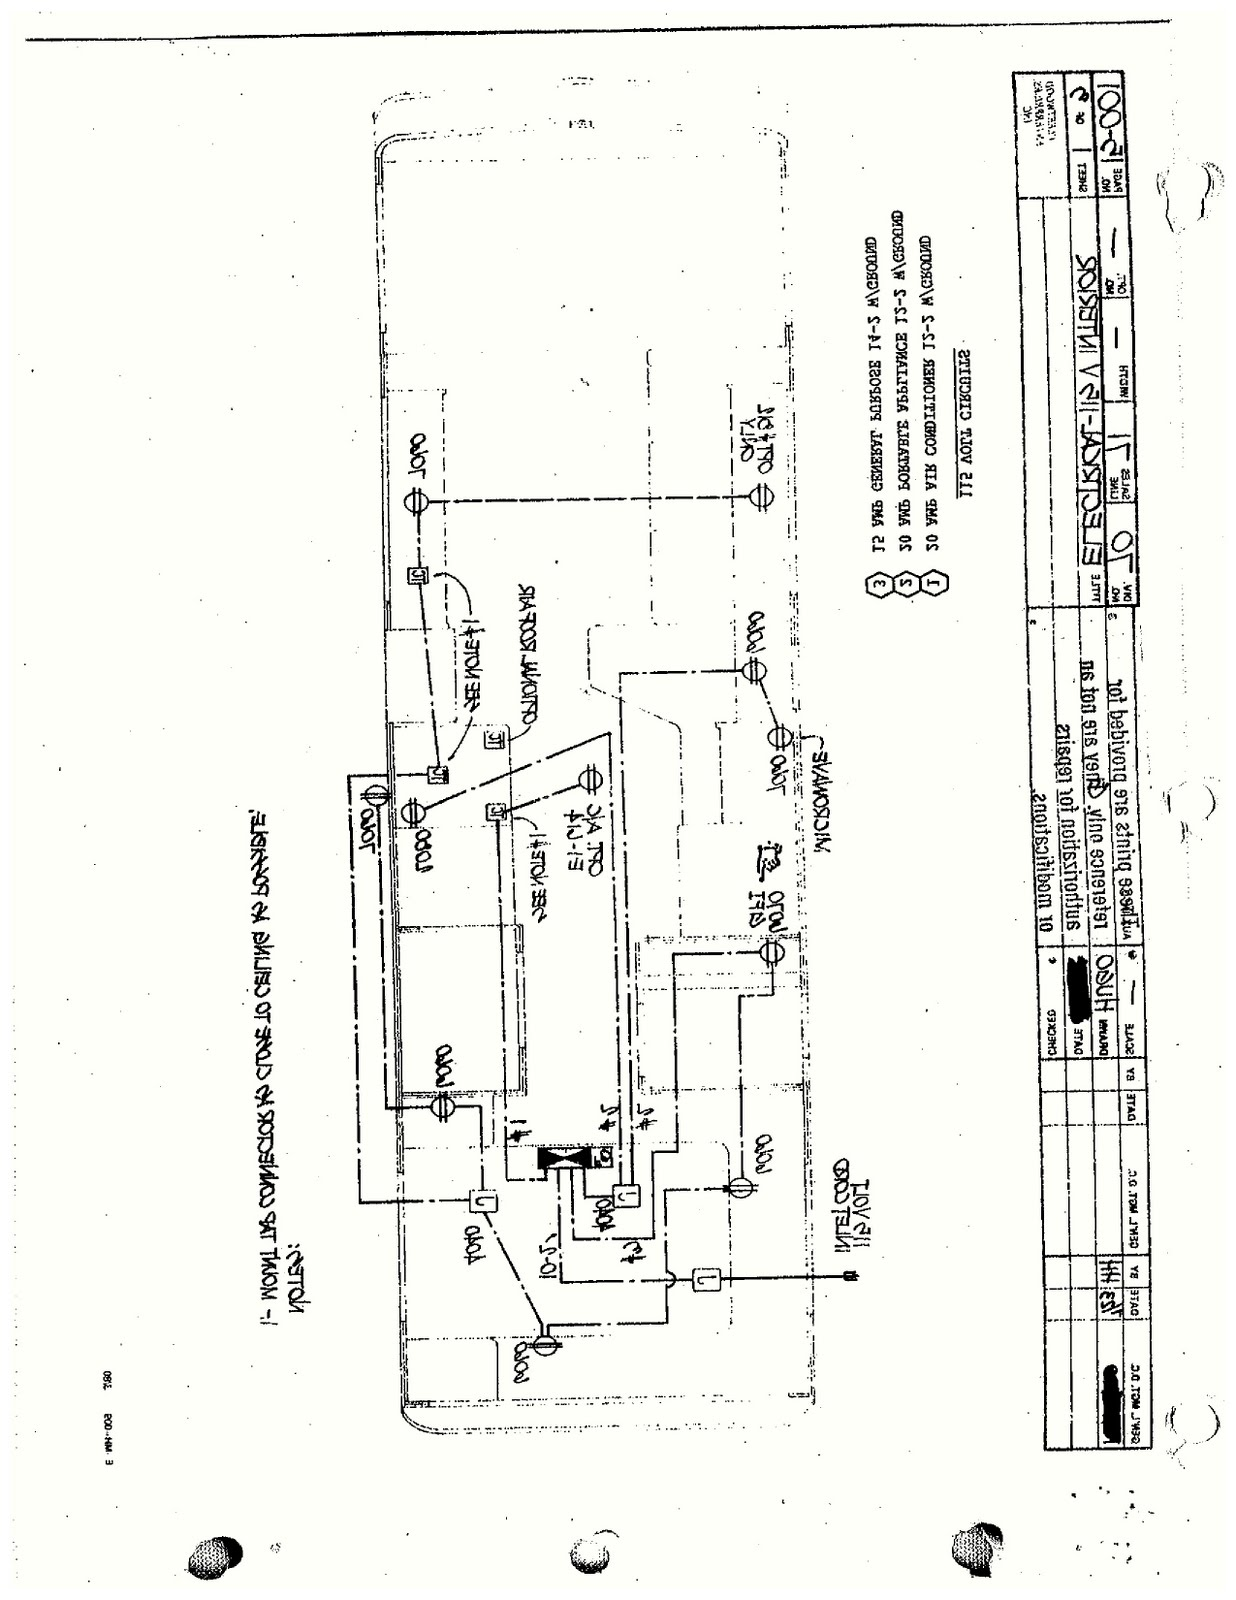 fleetwood prowler rv wiring diagram